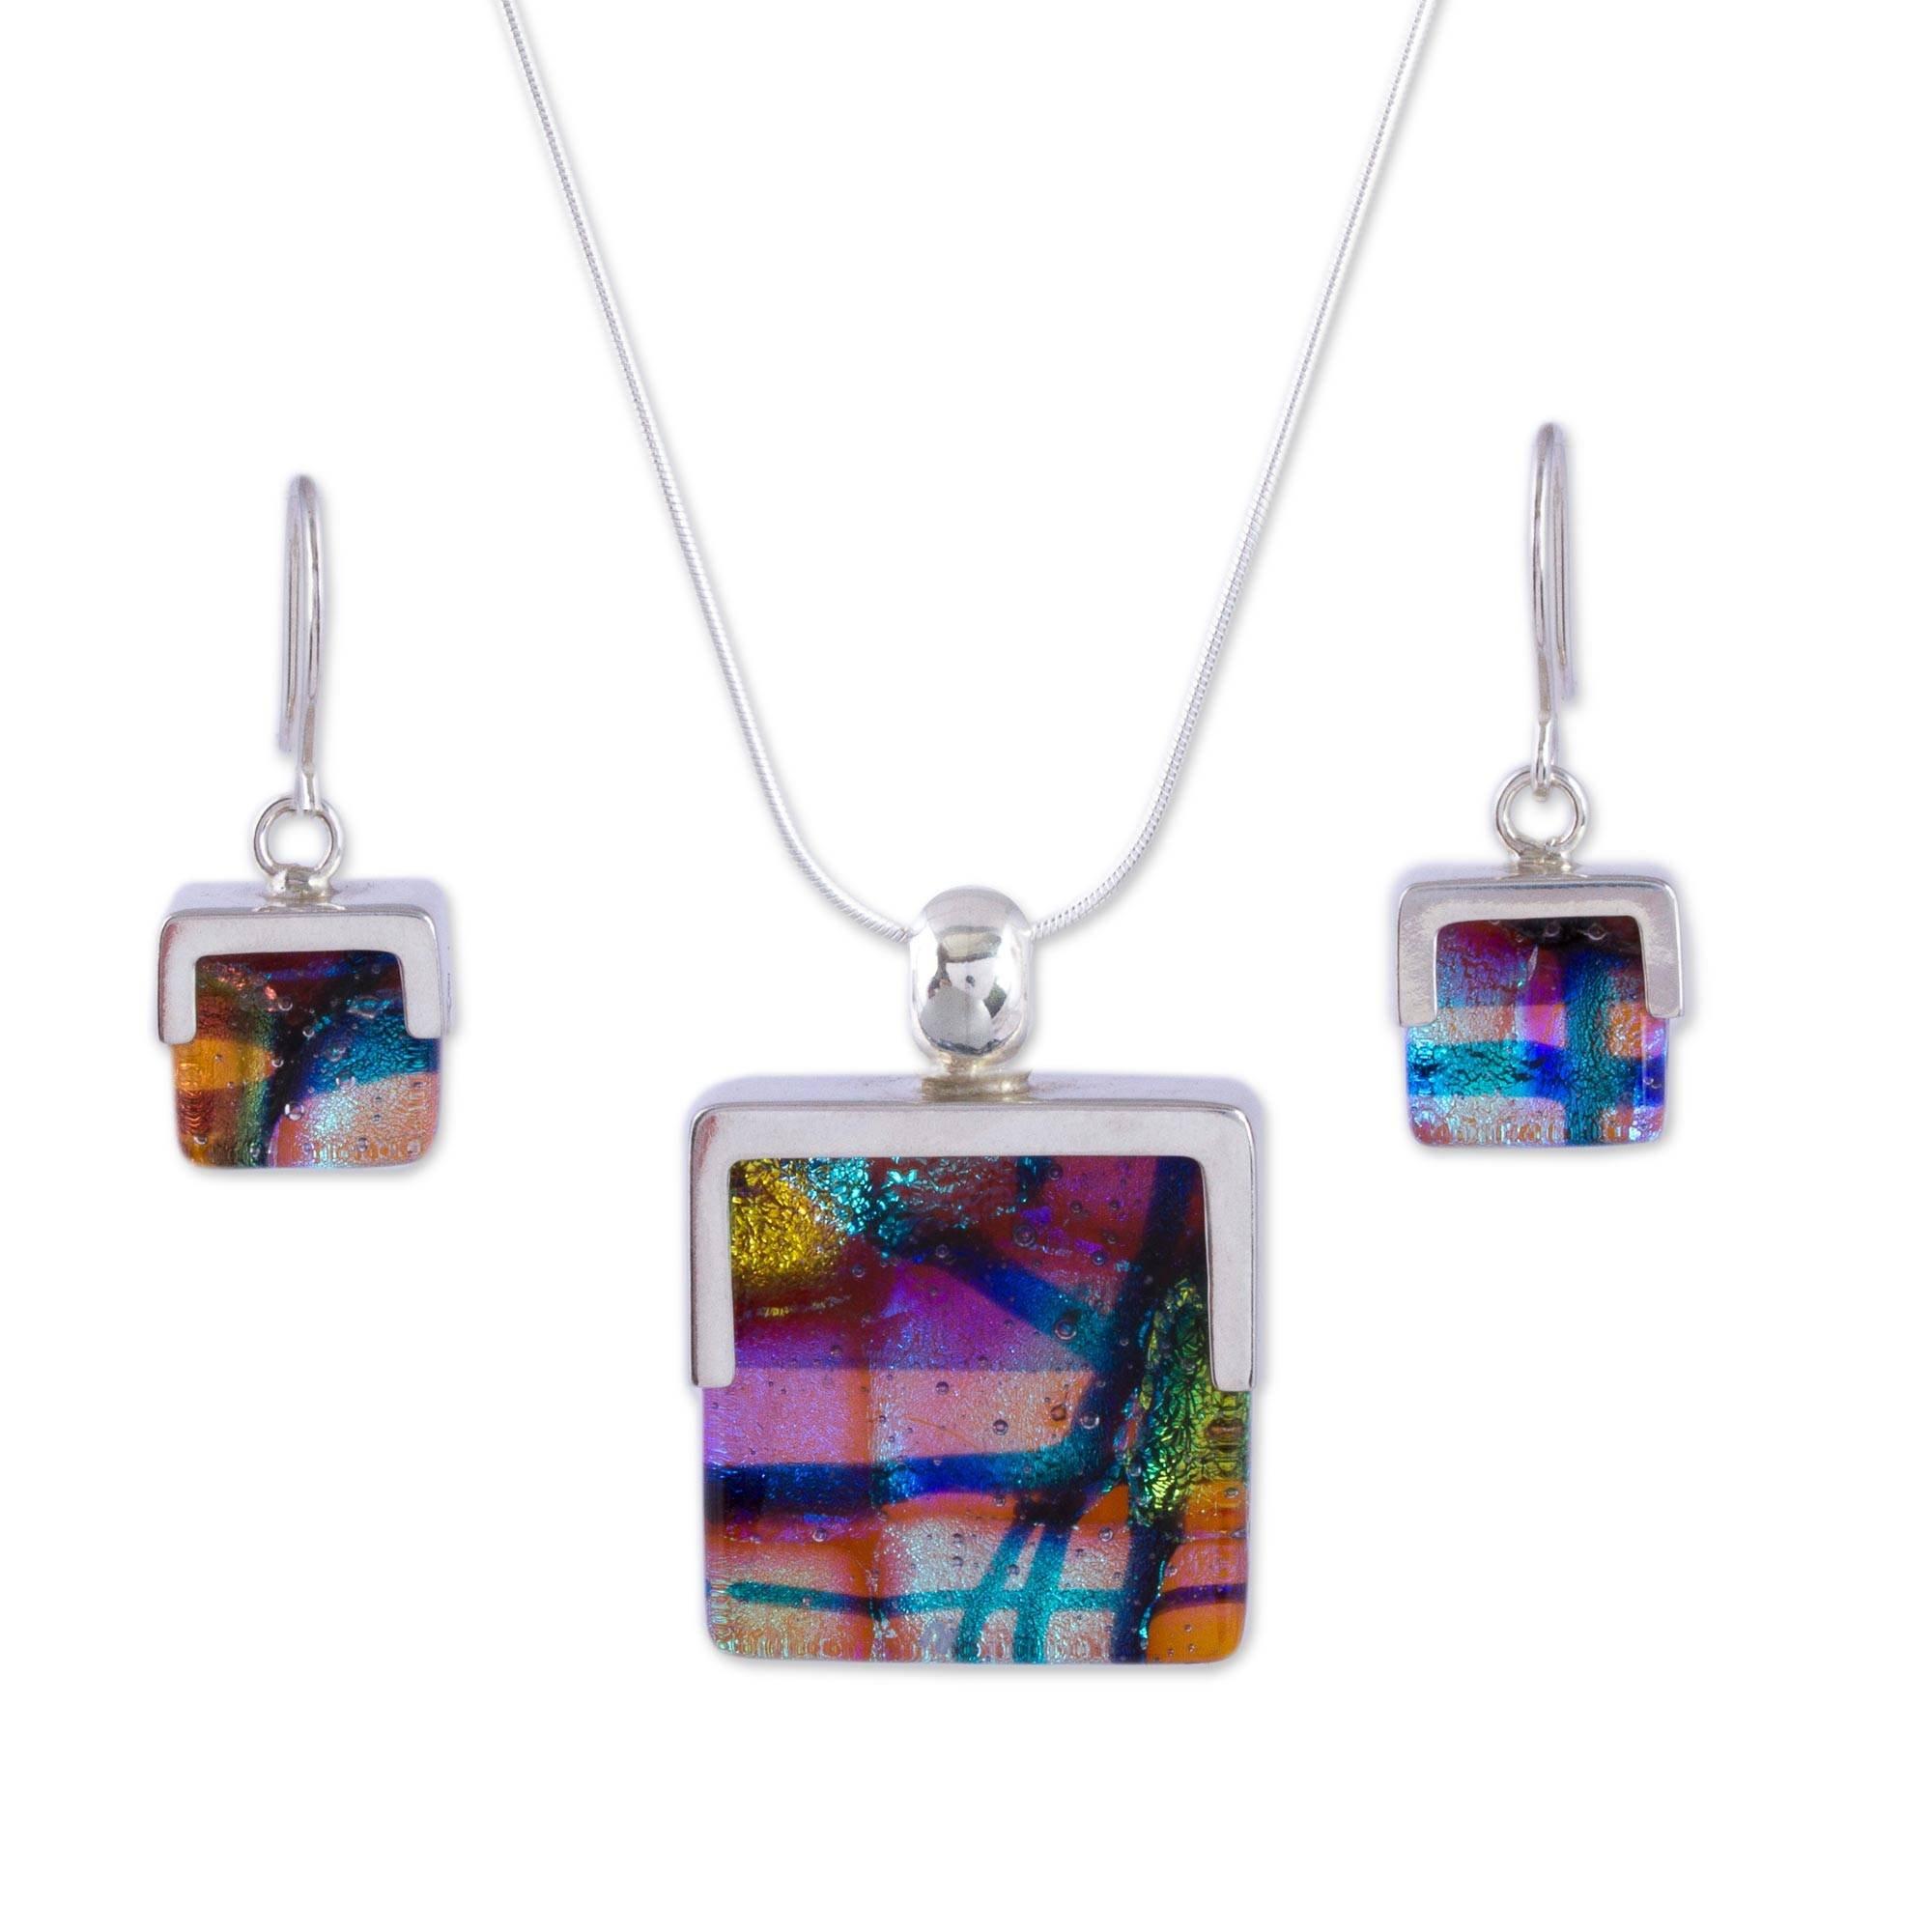 NOVICA .925 Sterling Silver Glass Jewelry Set 'Magic Mosaic'